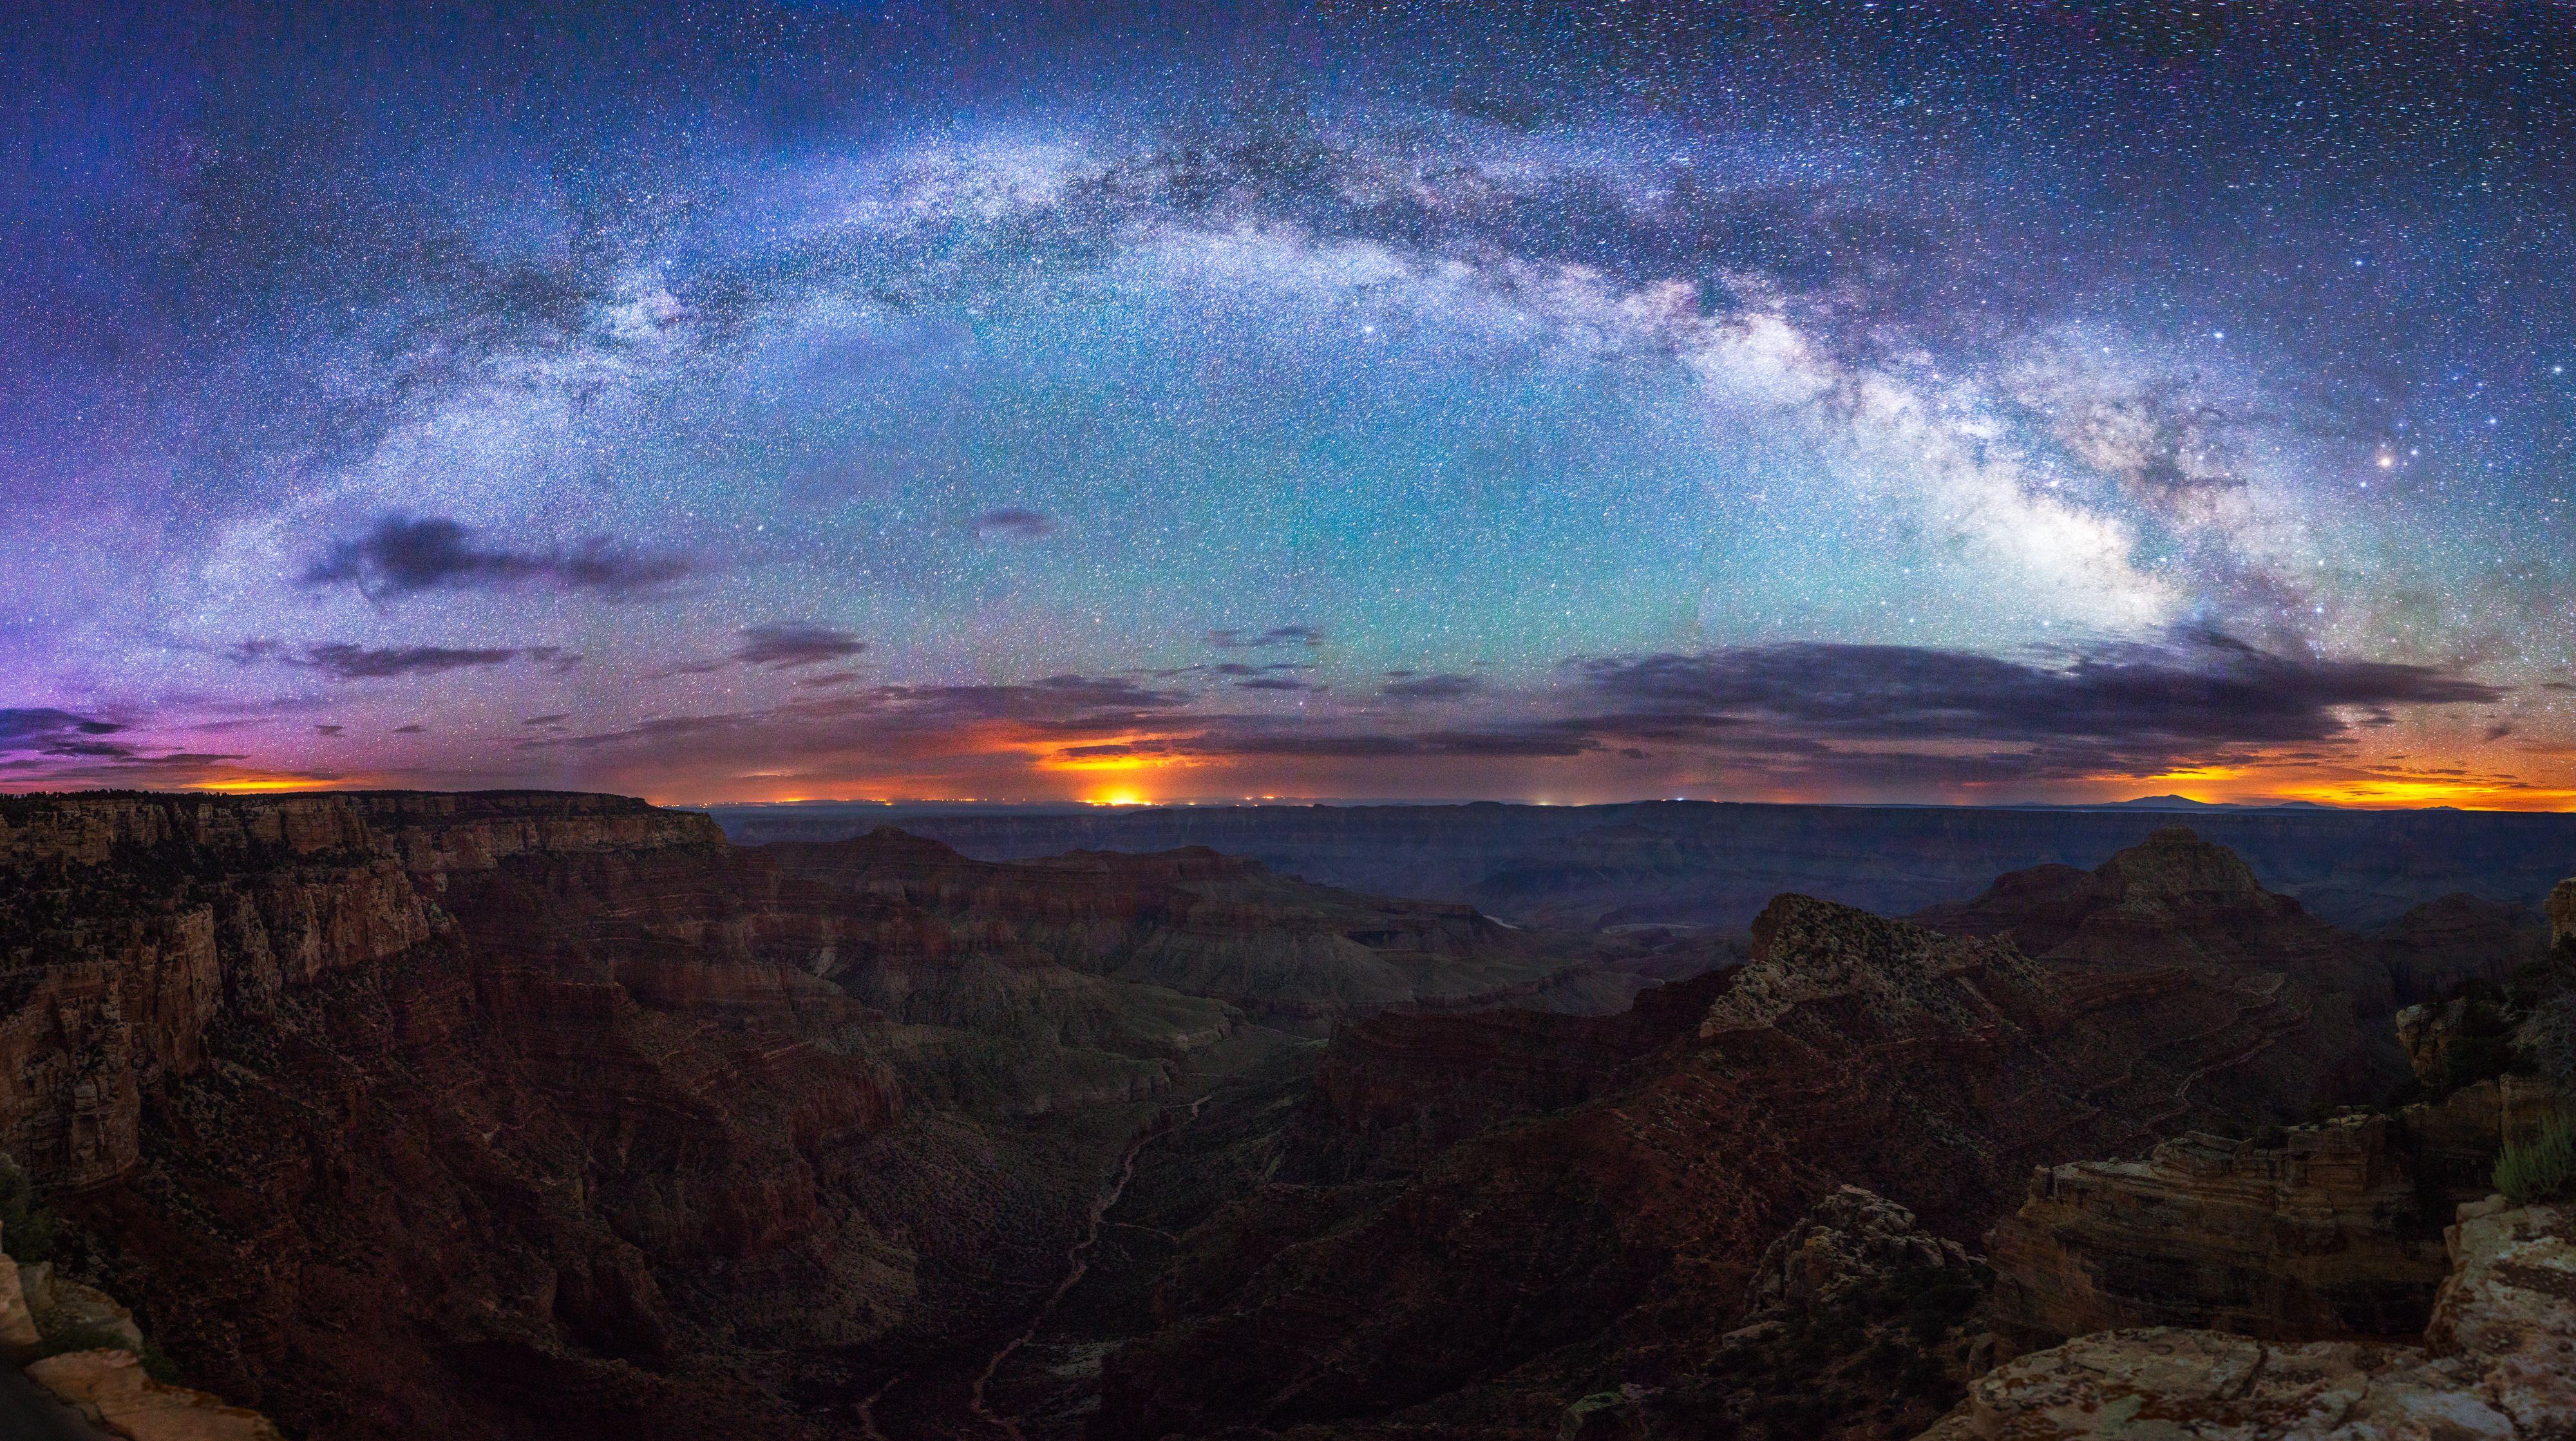 Arizona Wallpapers   Top Arizona Backgrounds   WallpaperAccess 4000x2238